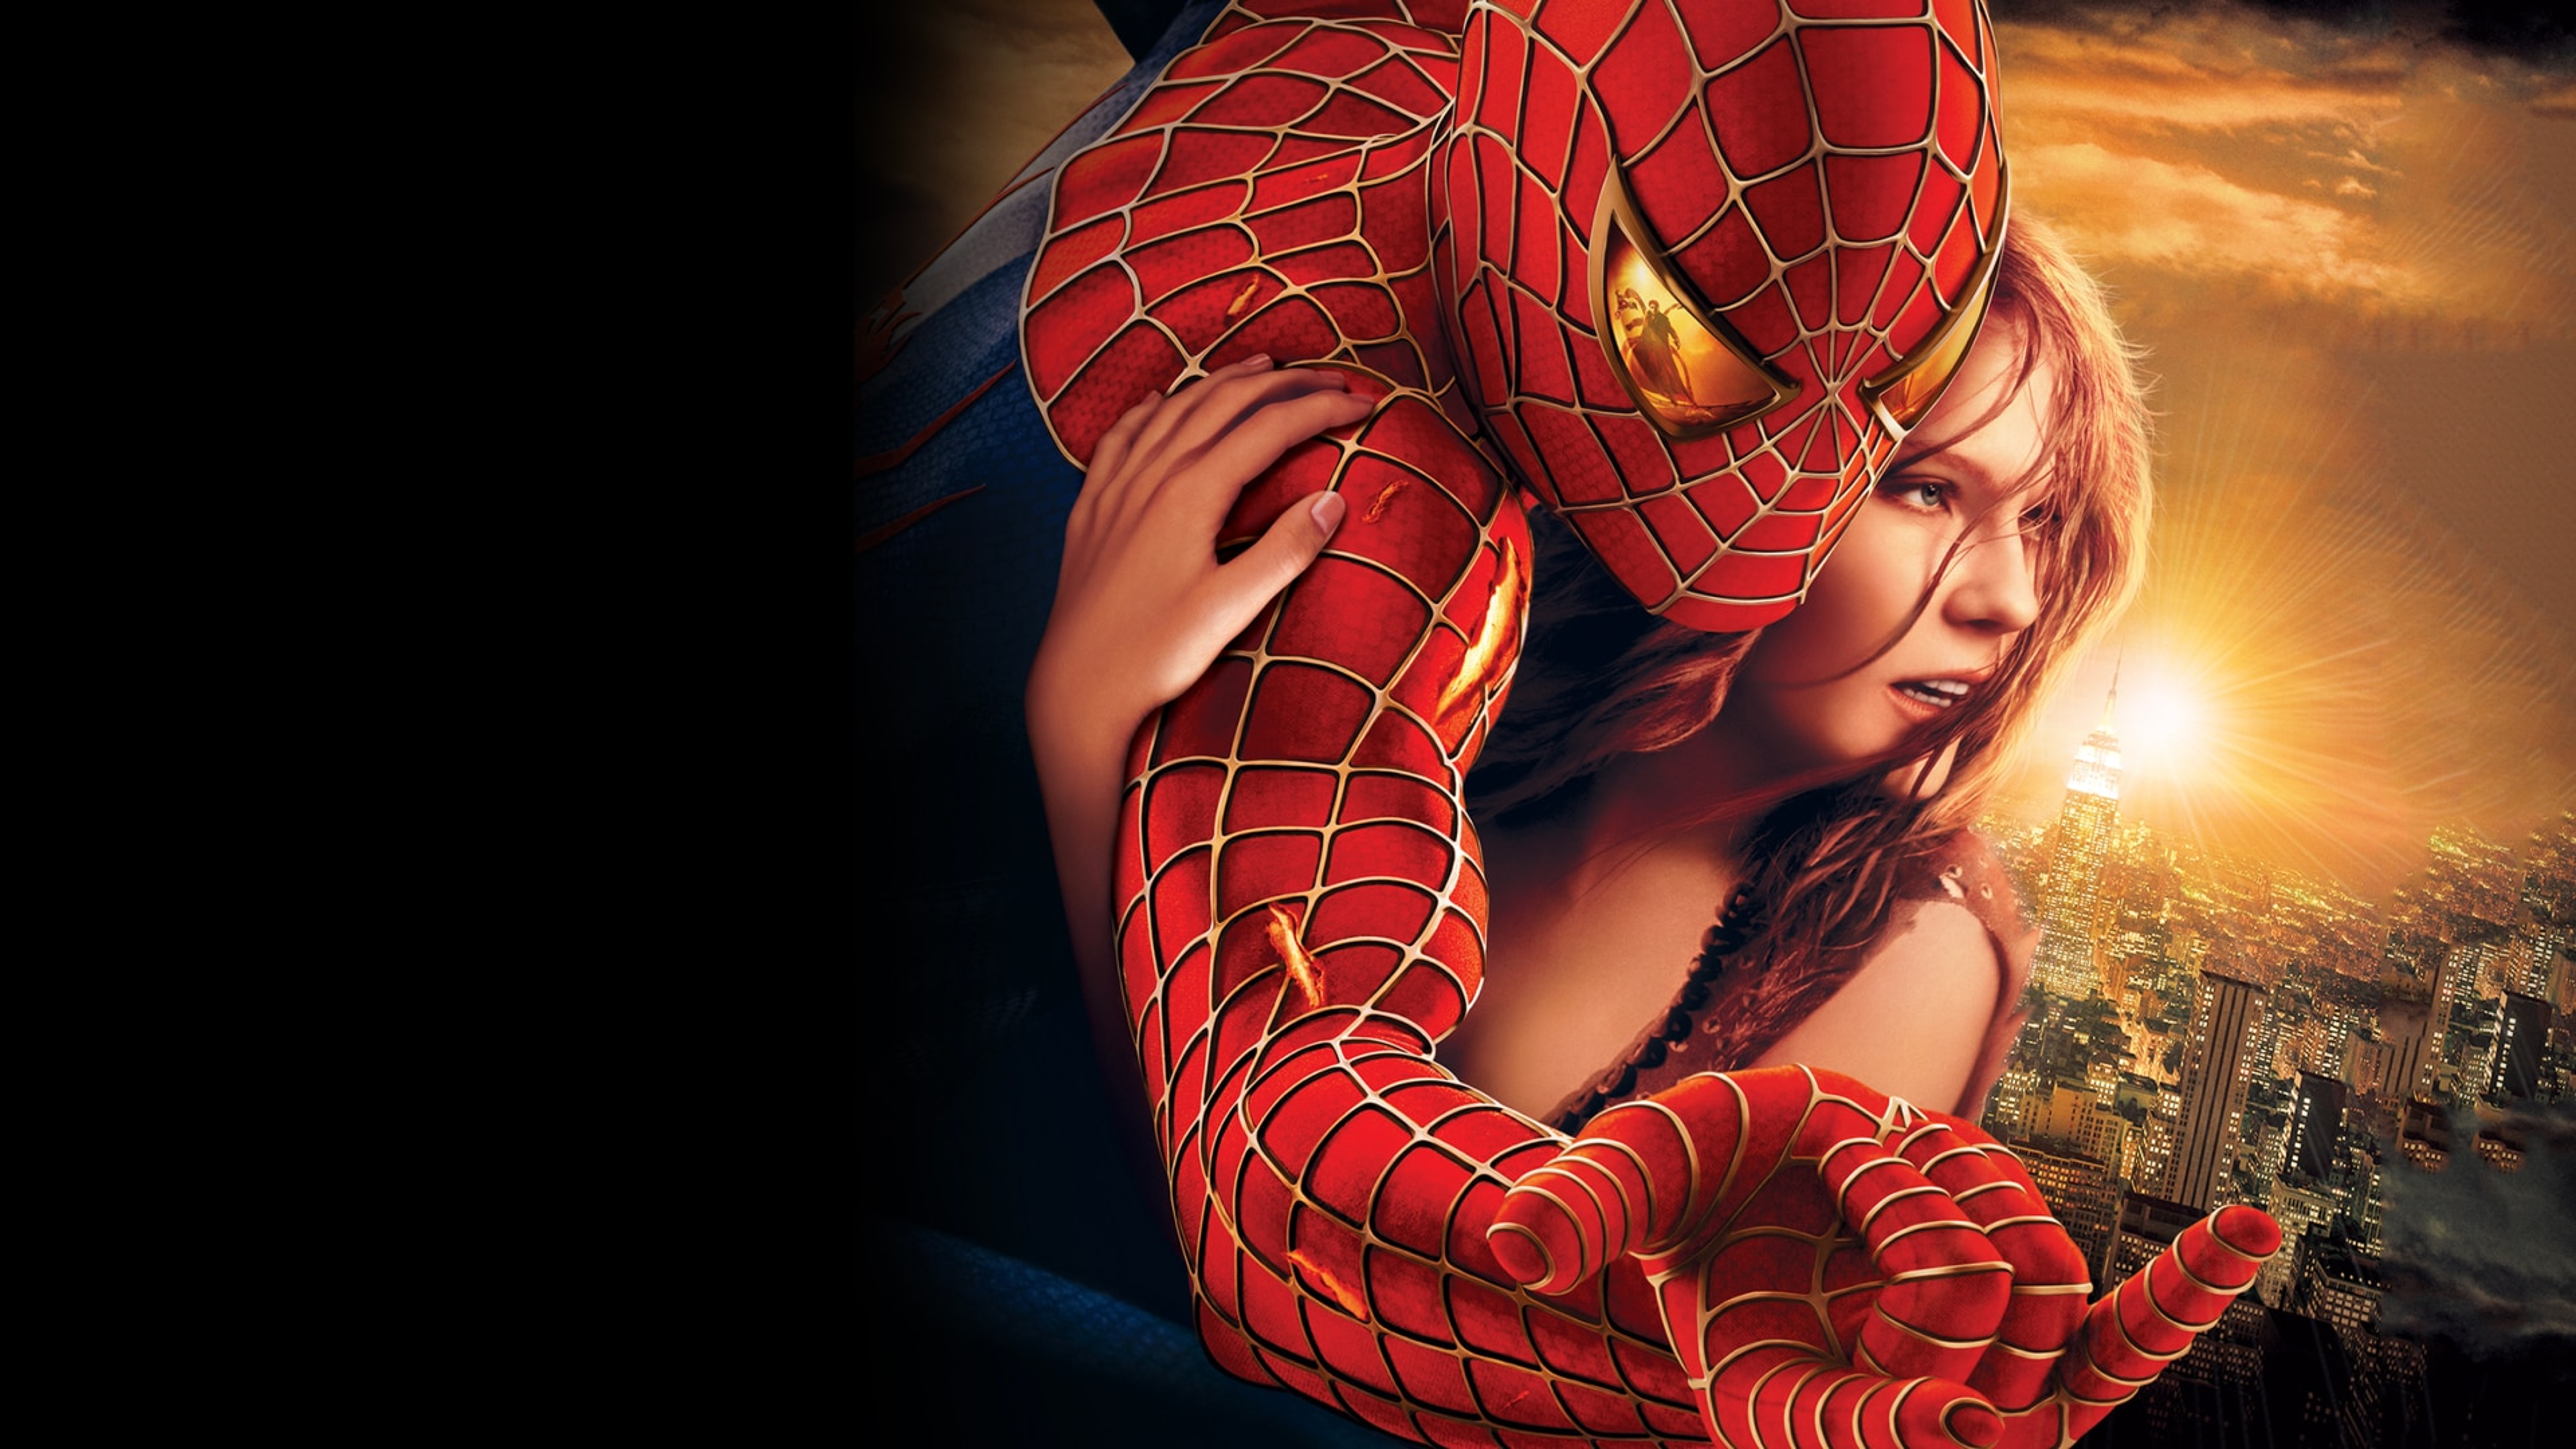 spider-man 2 | sky